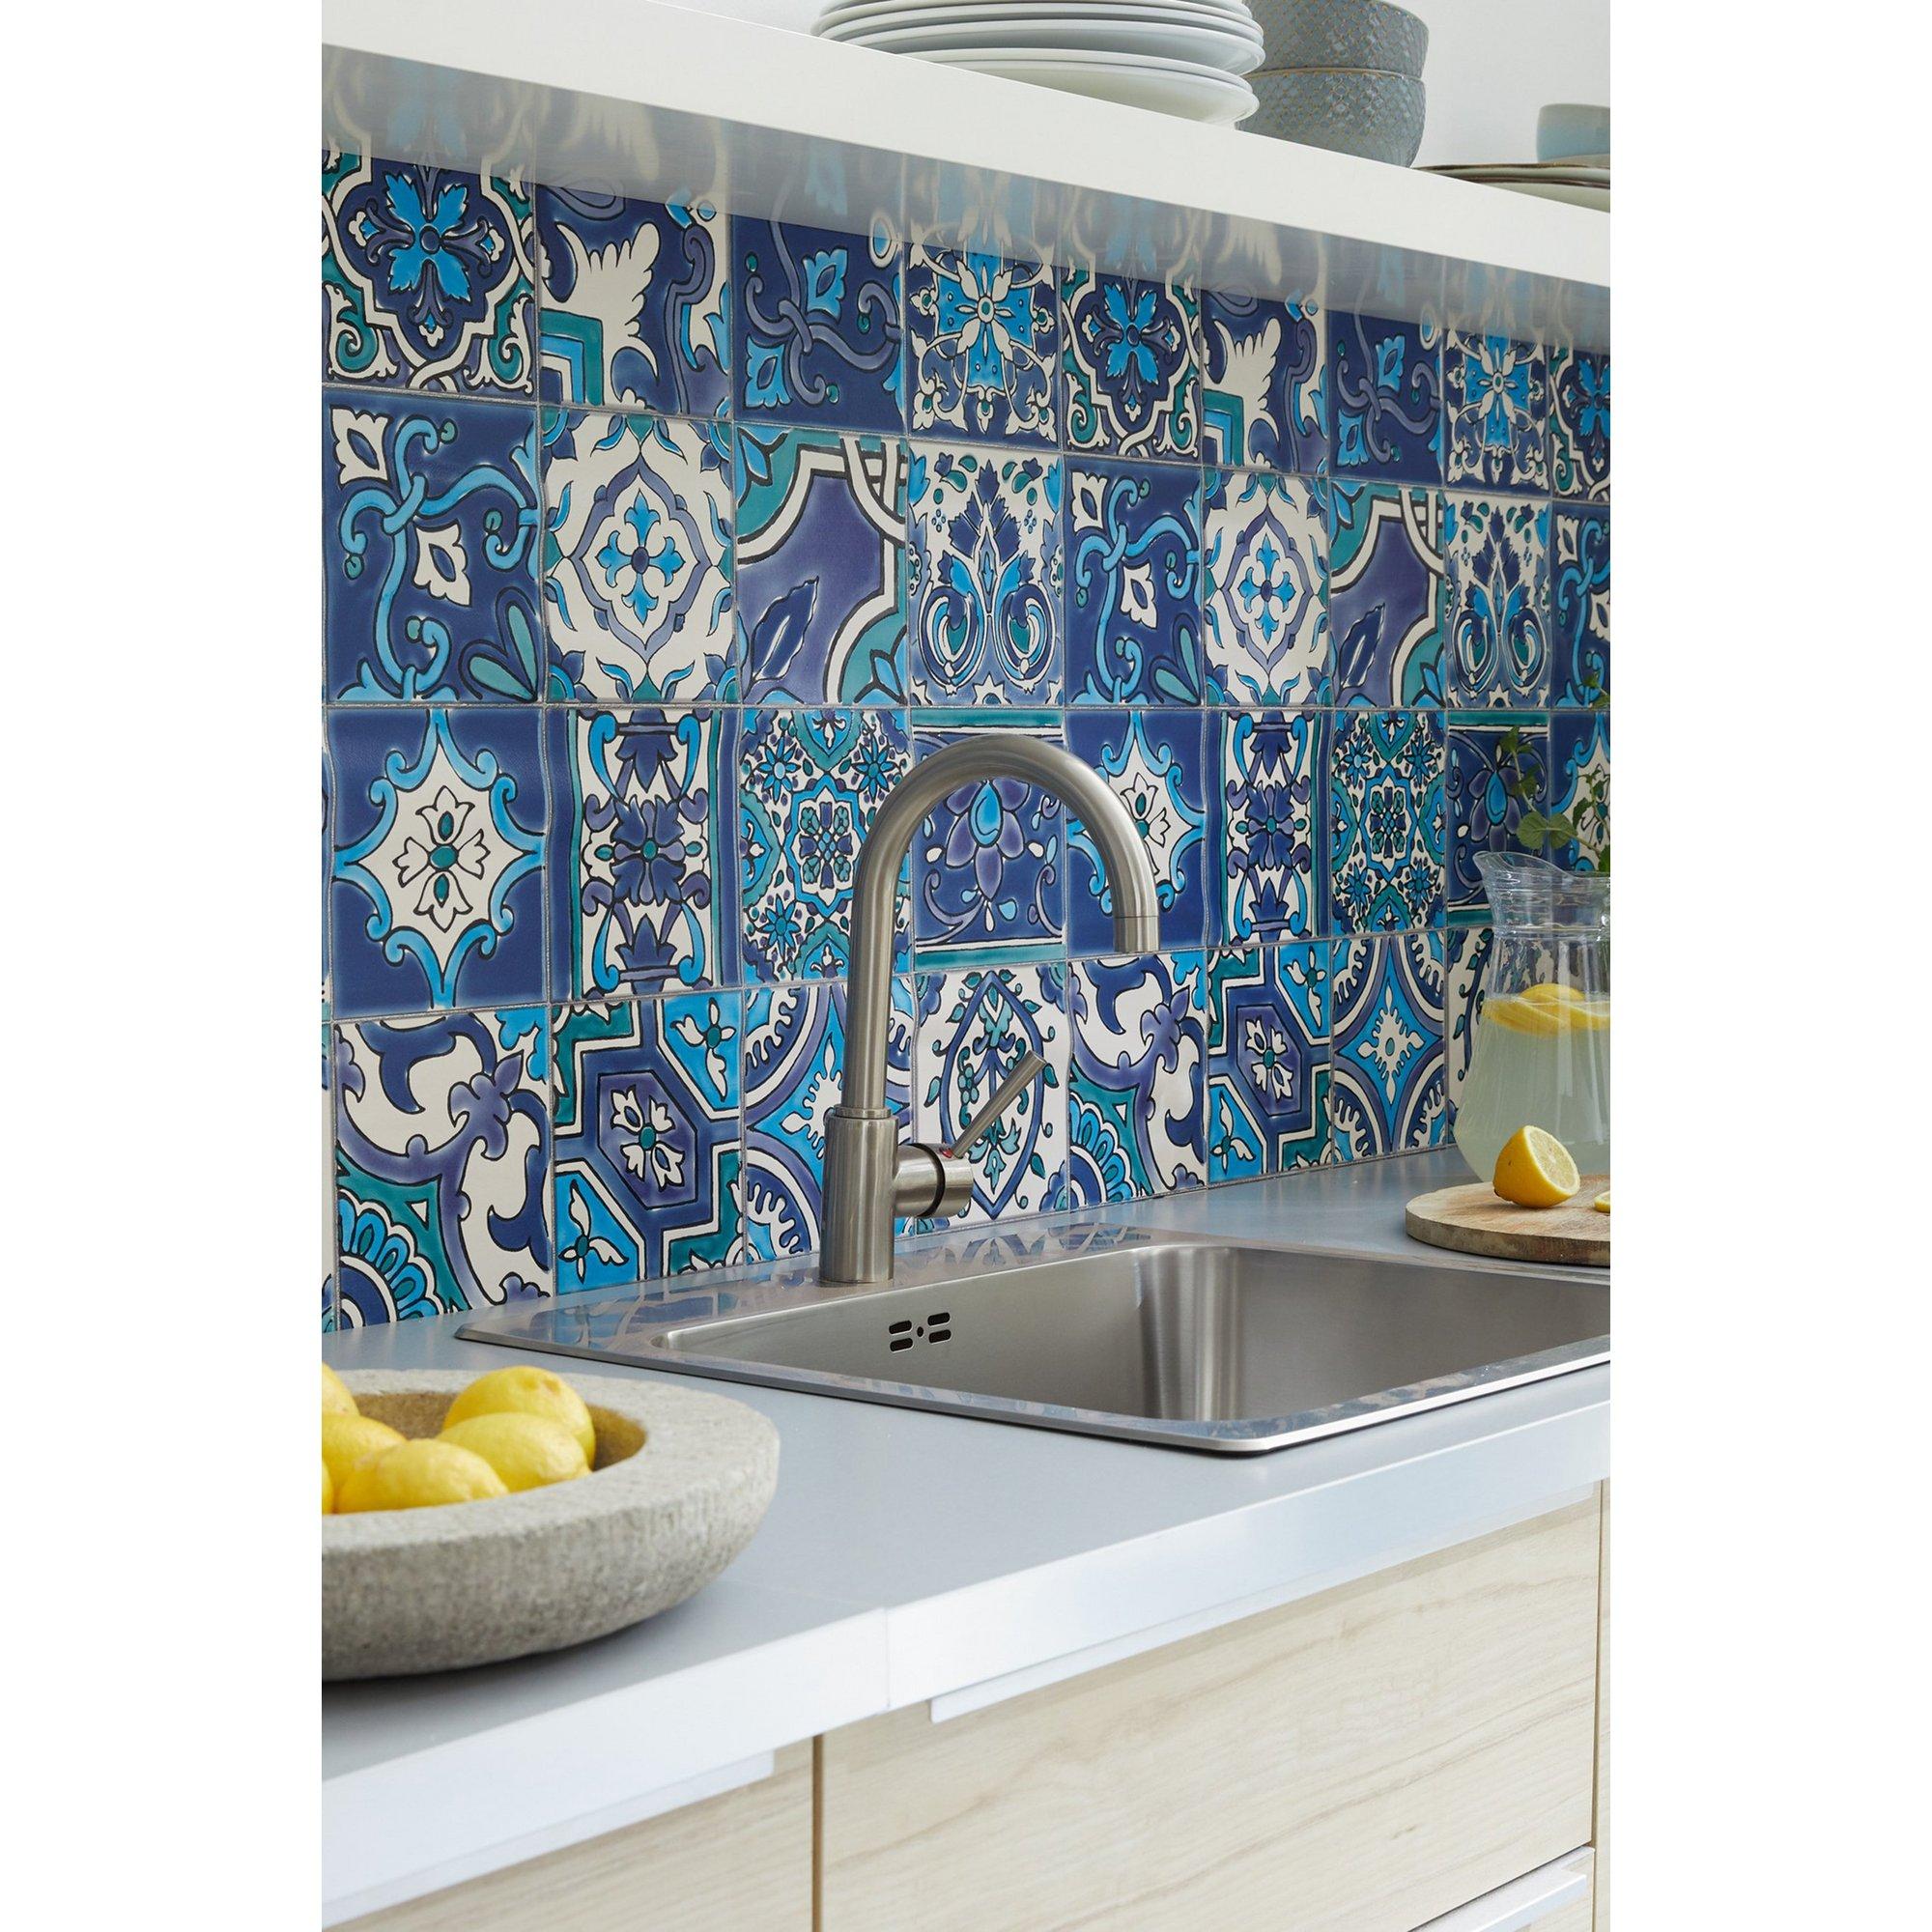 Image of D-C-Fix 3D Wallpaper for Splashbacks Moroccan Tile Russian Blue